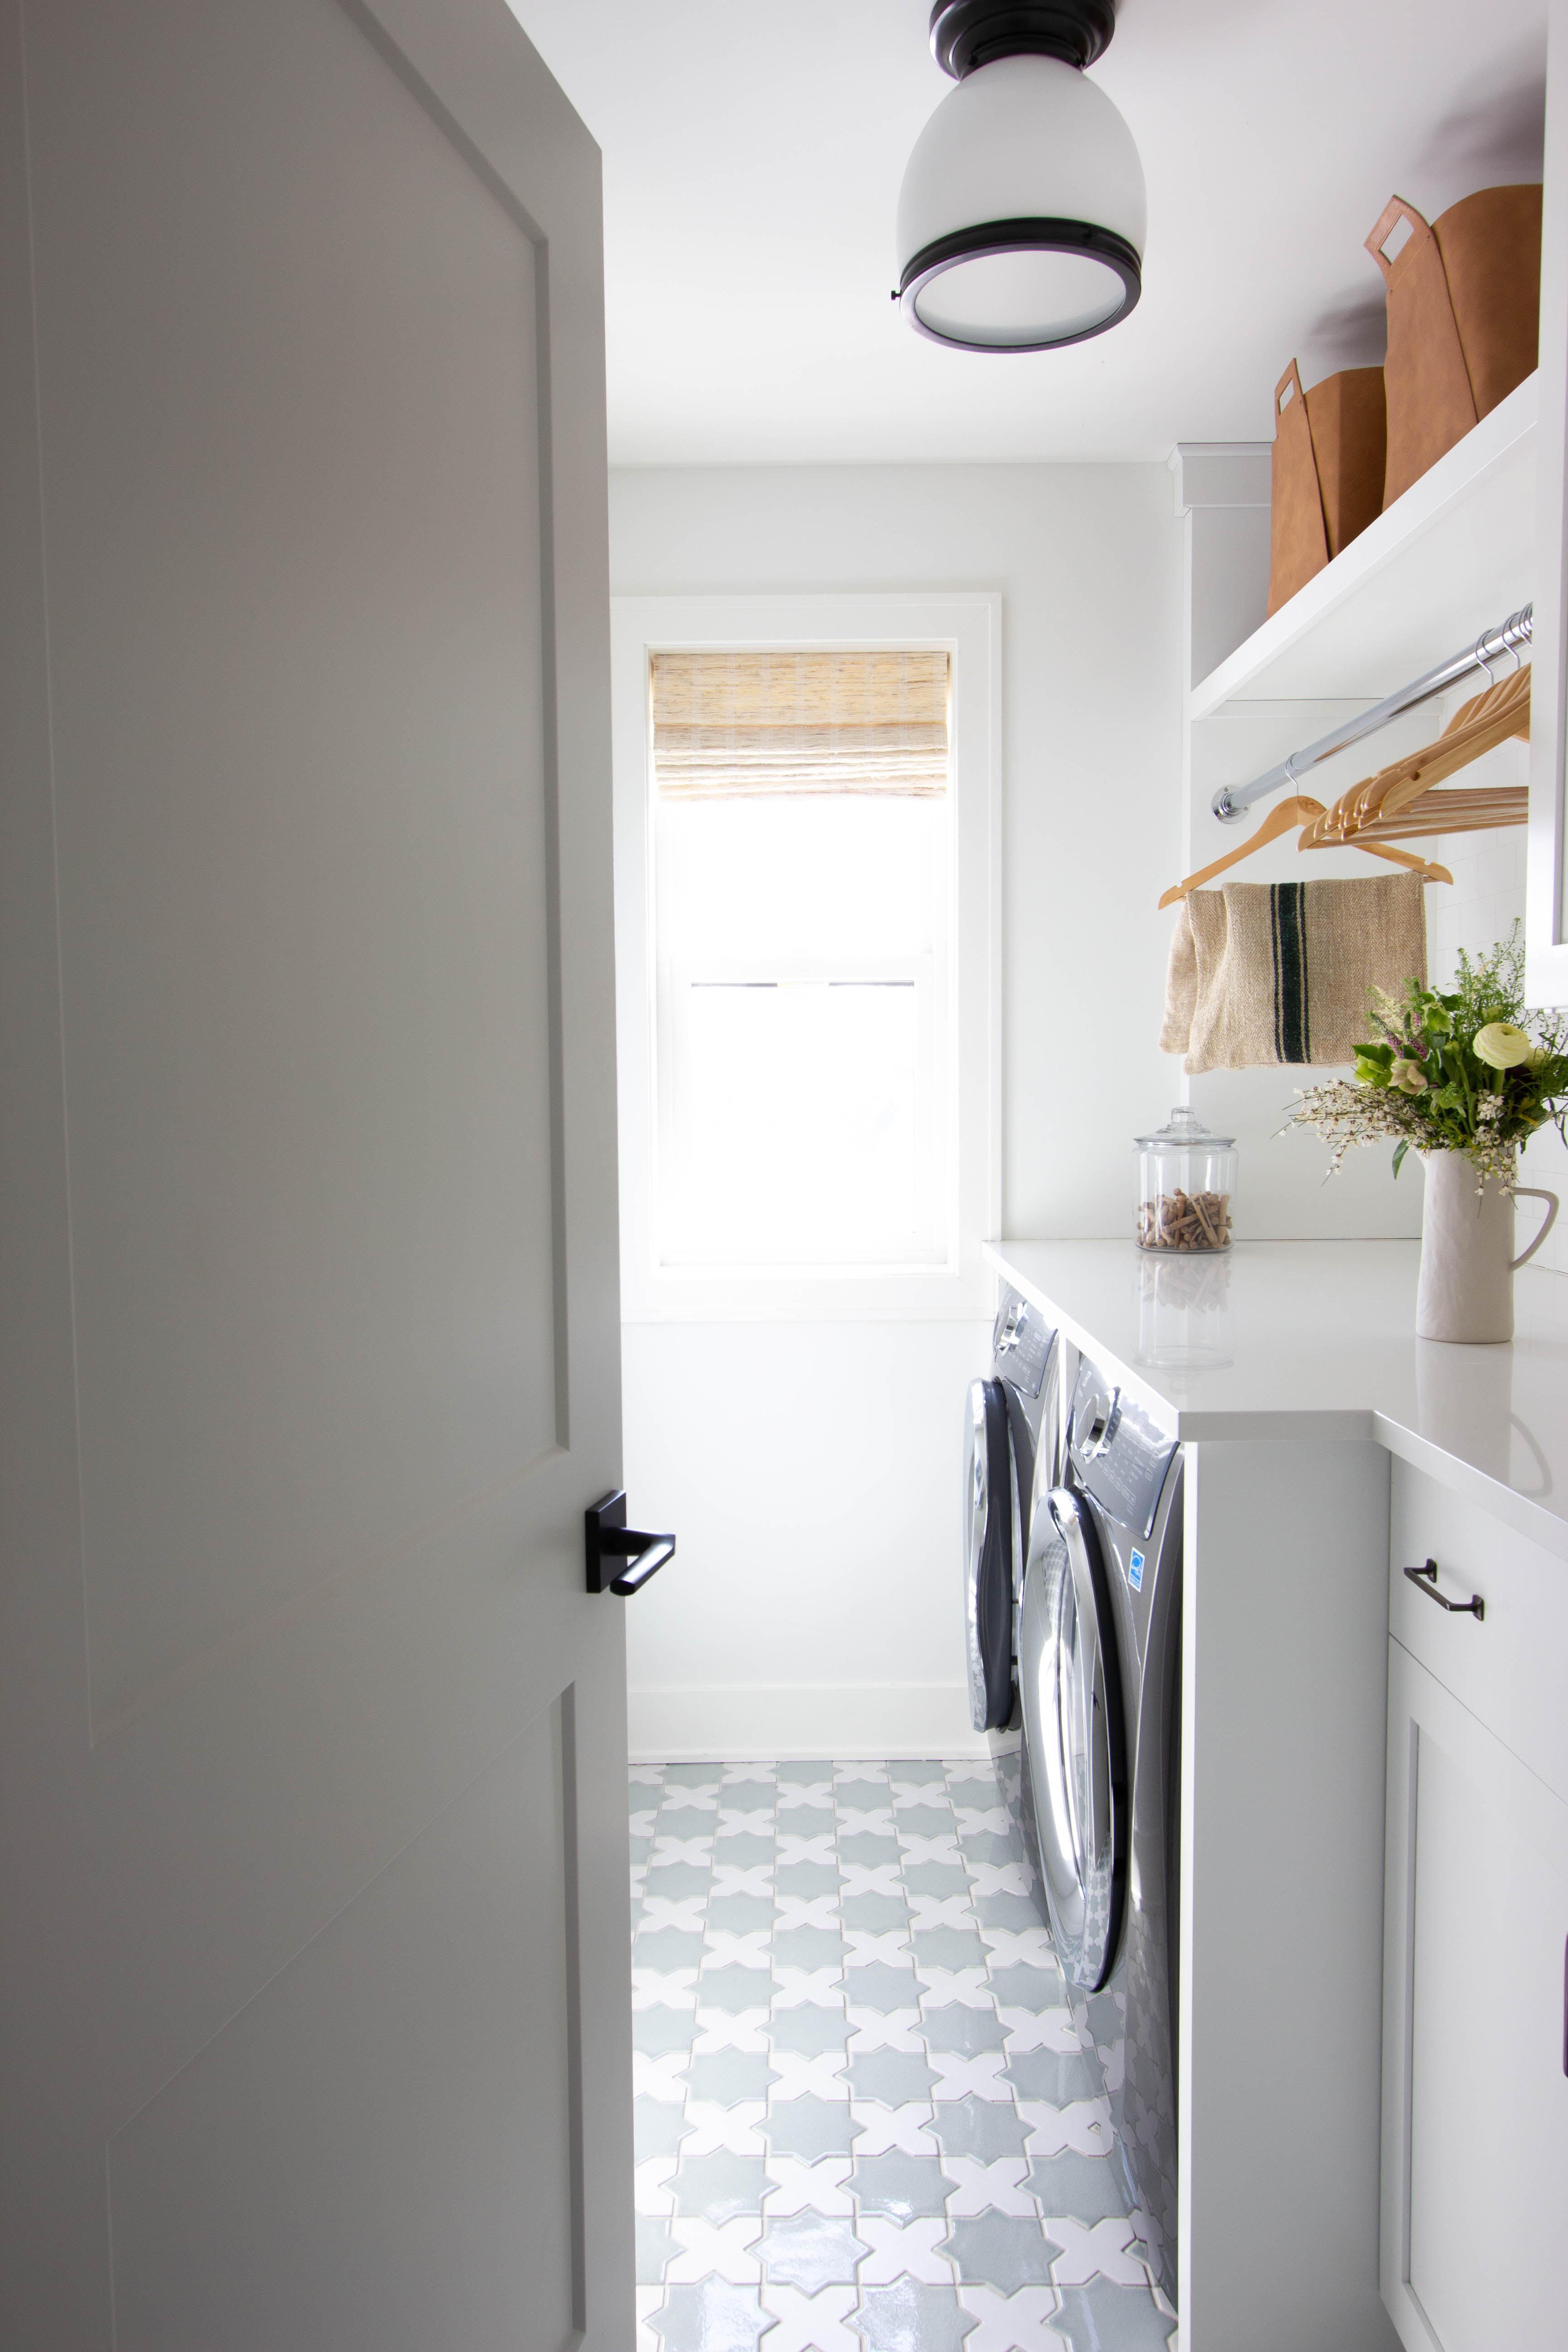 design trends hardworking laundry rooms fireclay tile. Black Bedroom Furniture Sets. Home Design Ideas